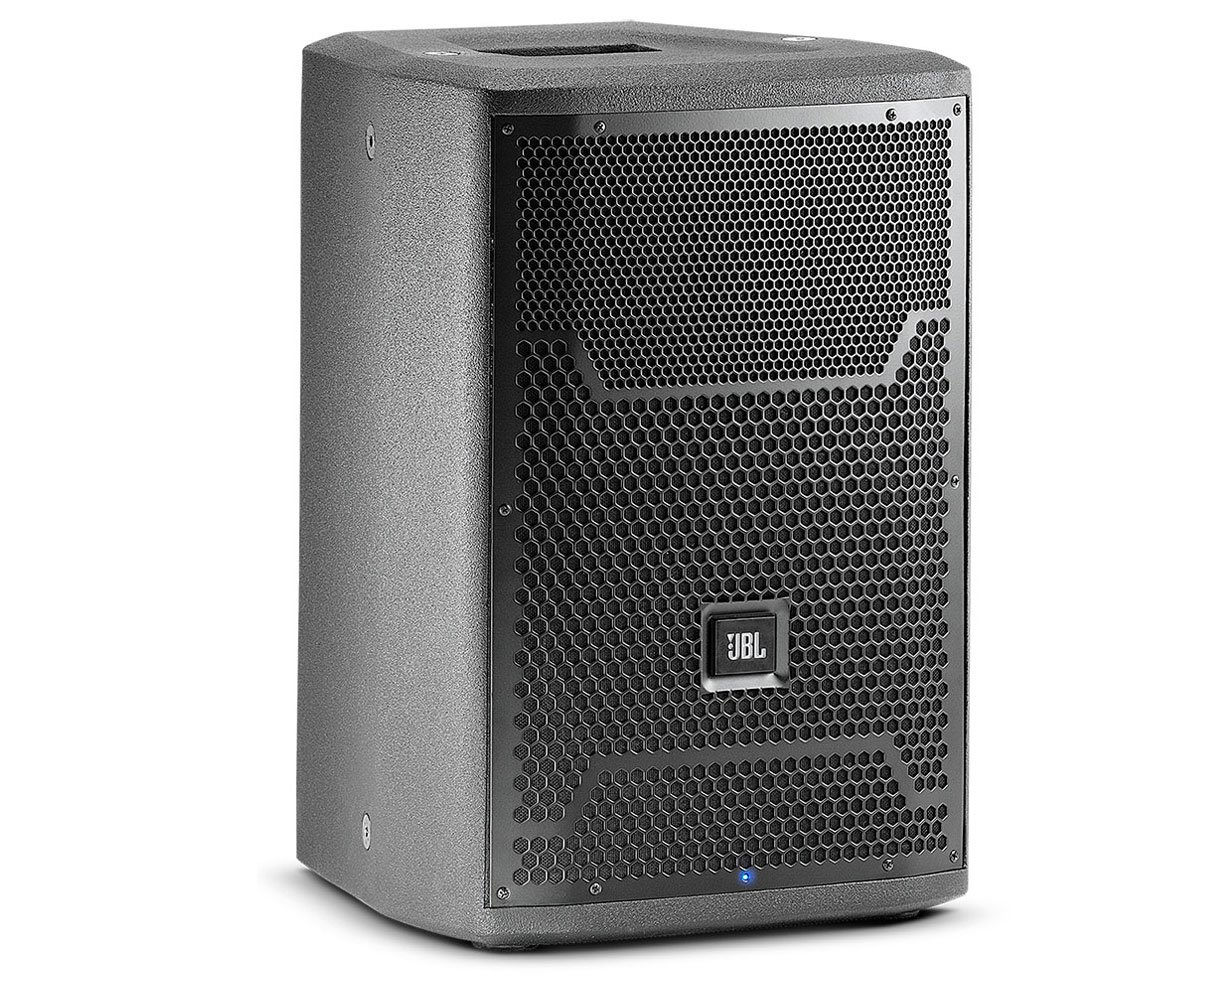 JBL PRX710 10-Inch Two-Way Multi Purpose Self-Powered Sound Reinforcement